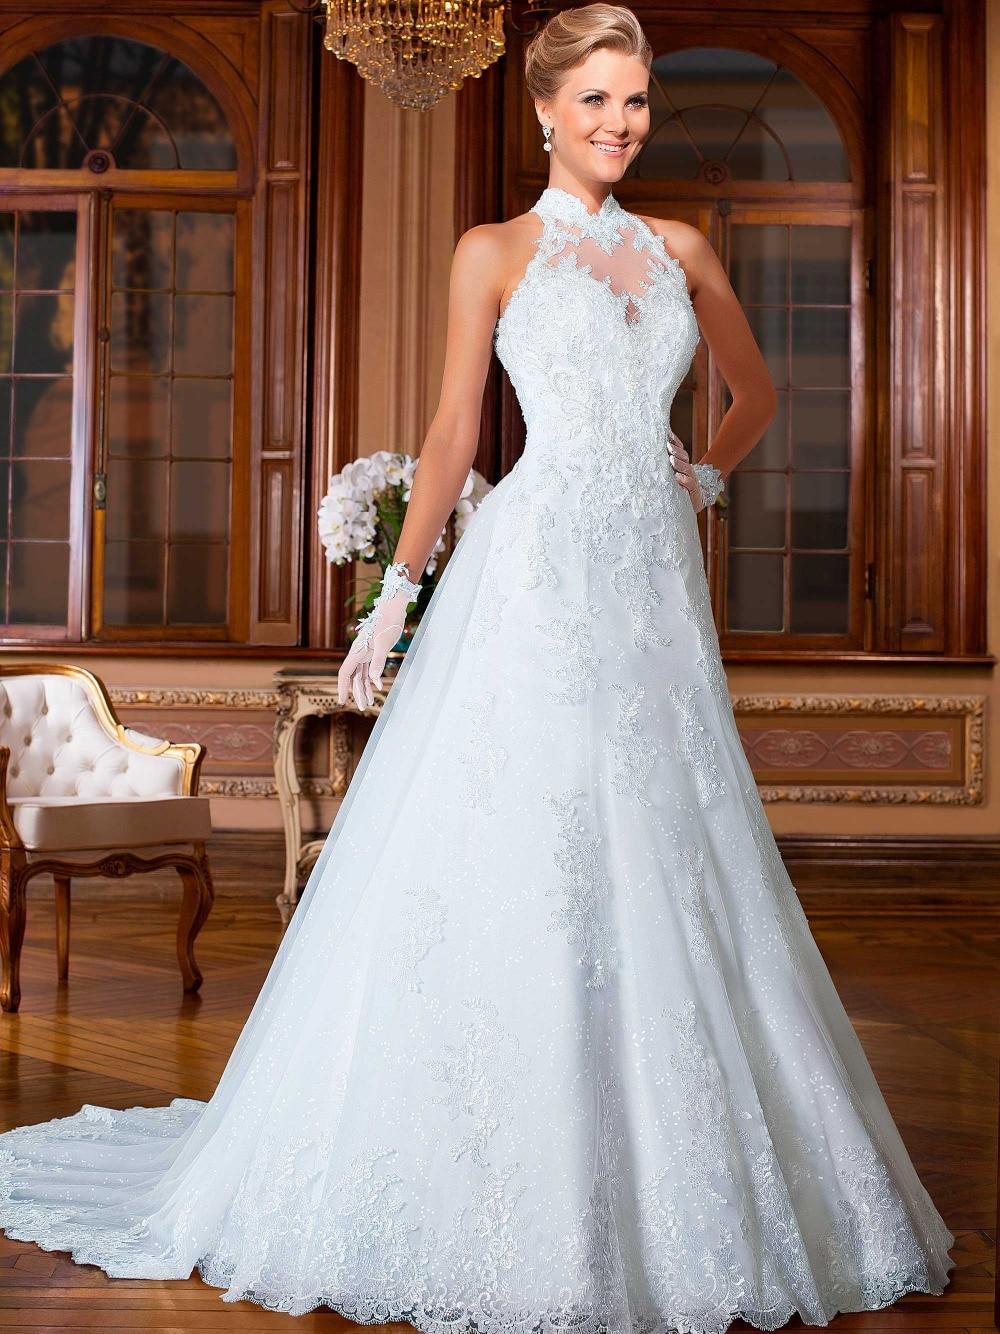 Vestido De Noiva 2015 Nuevo Diseño De Encaje Vestidos Novia